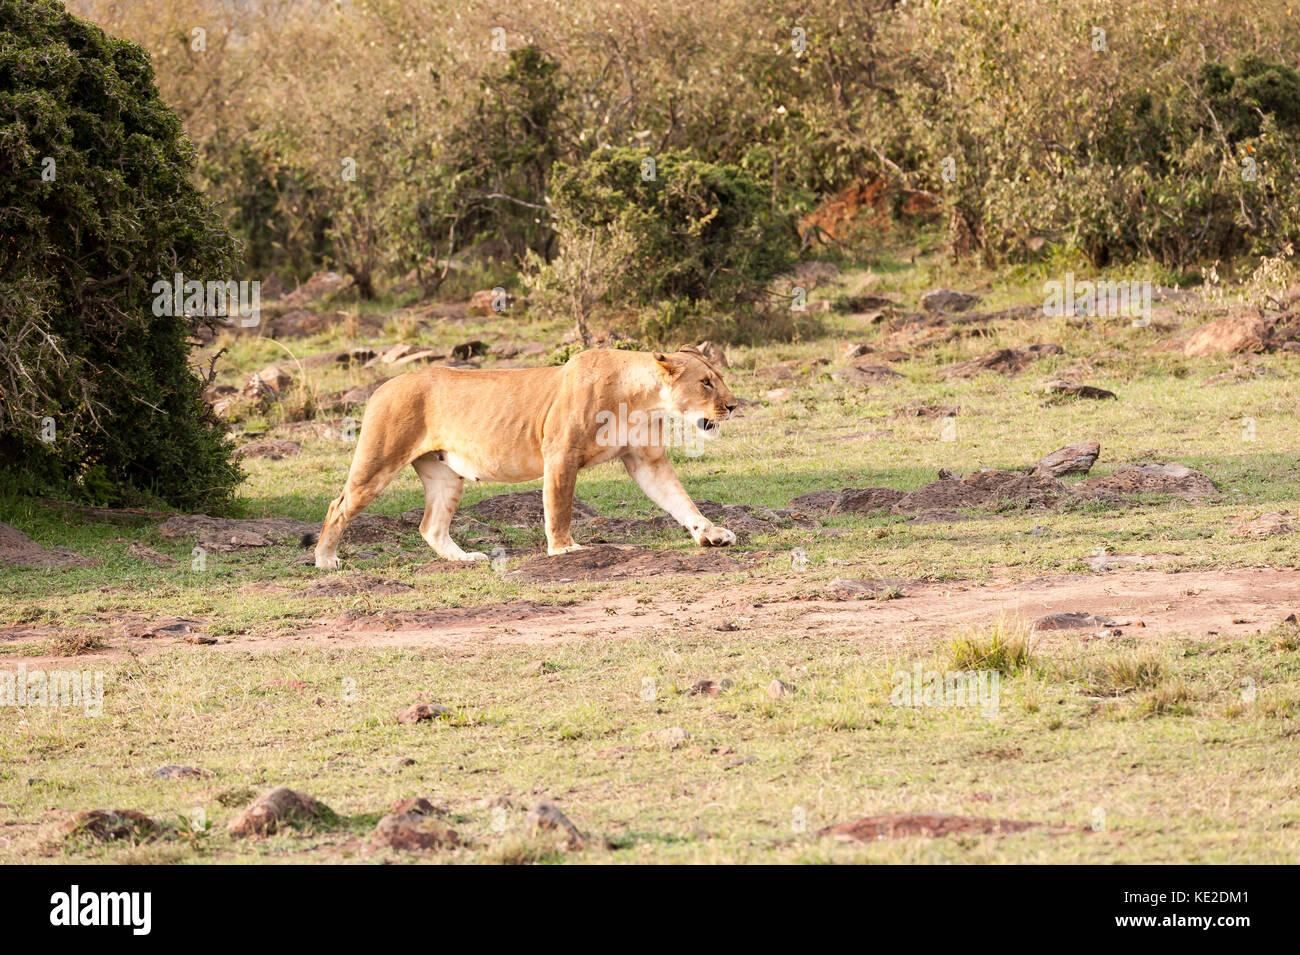 Female Lion in the Maasai Mara National Reserve Stock Photo